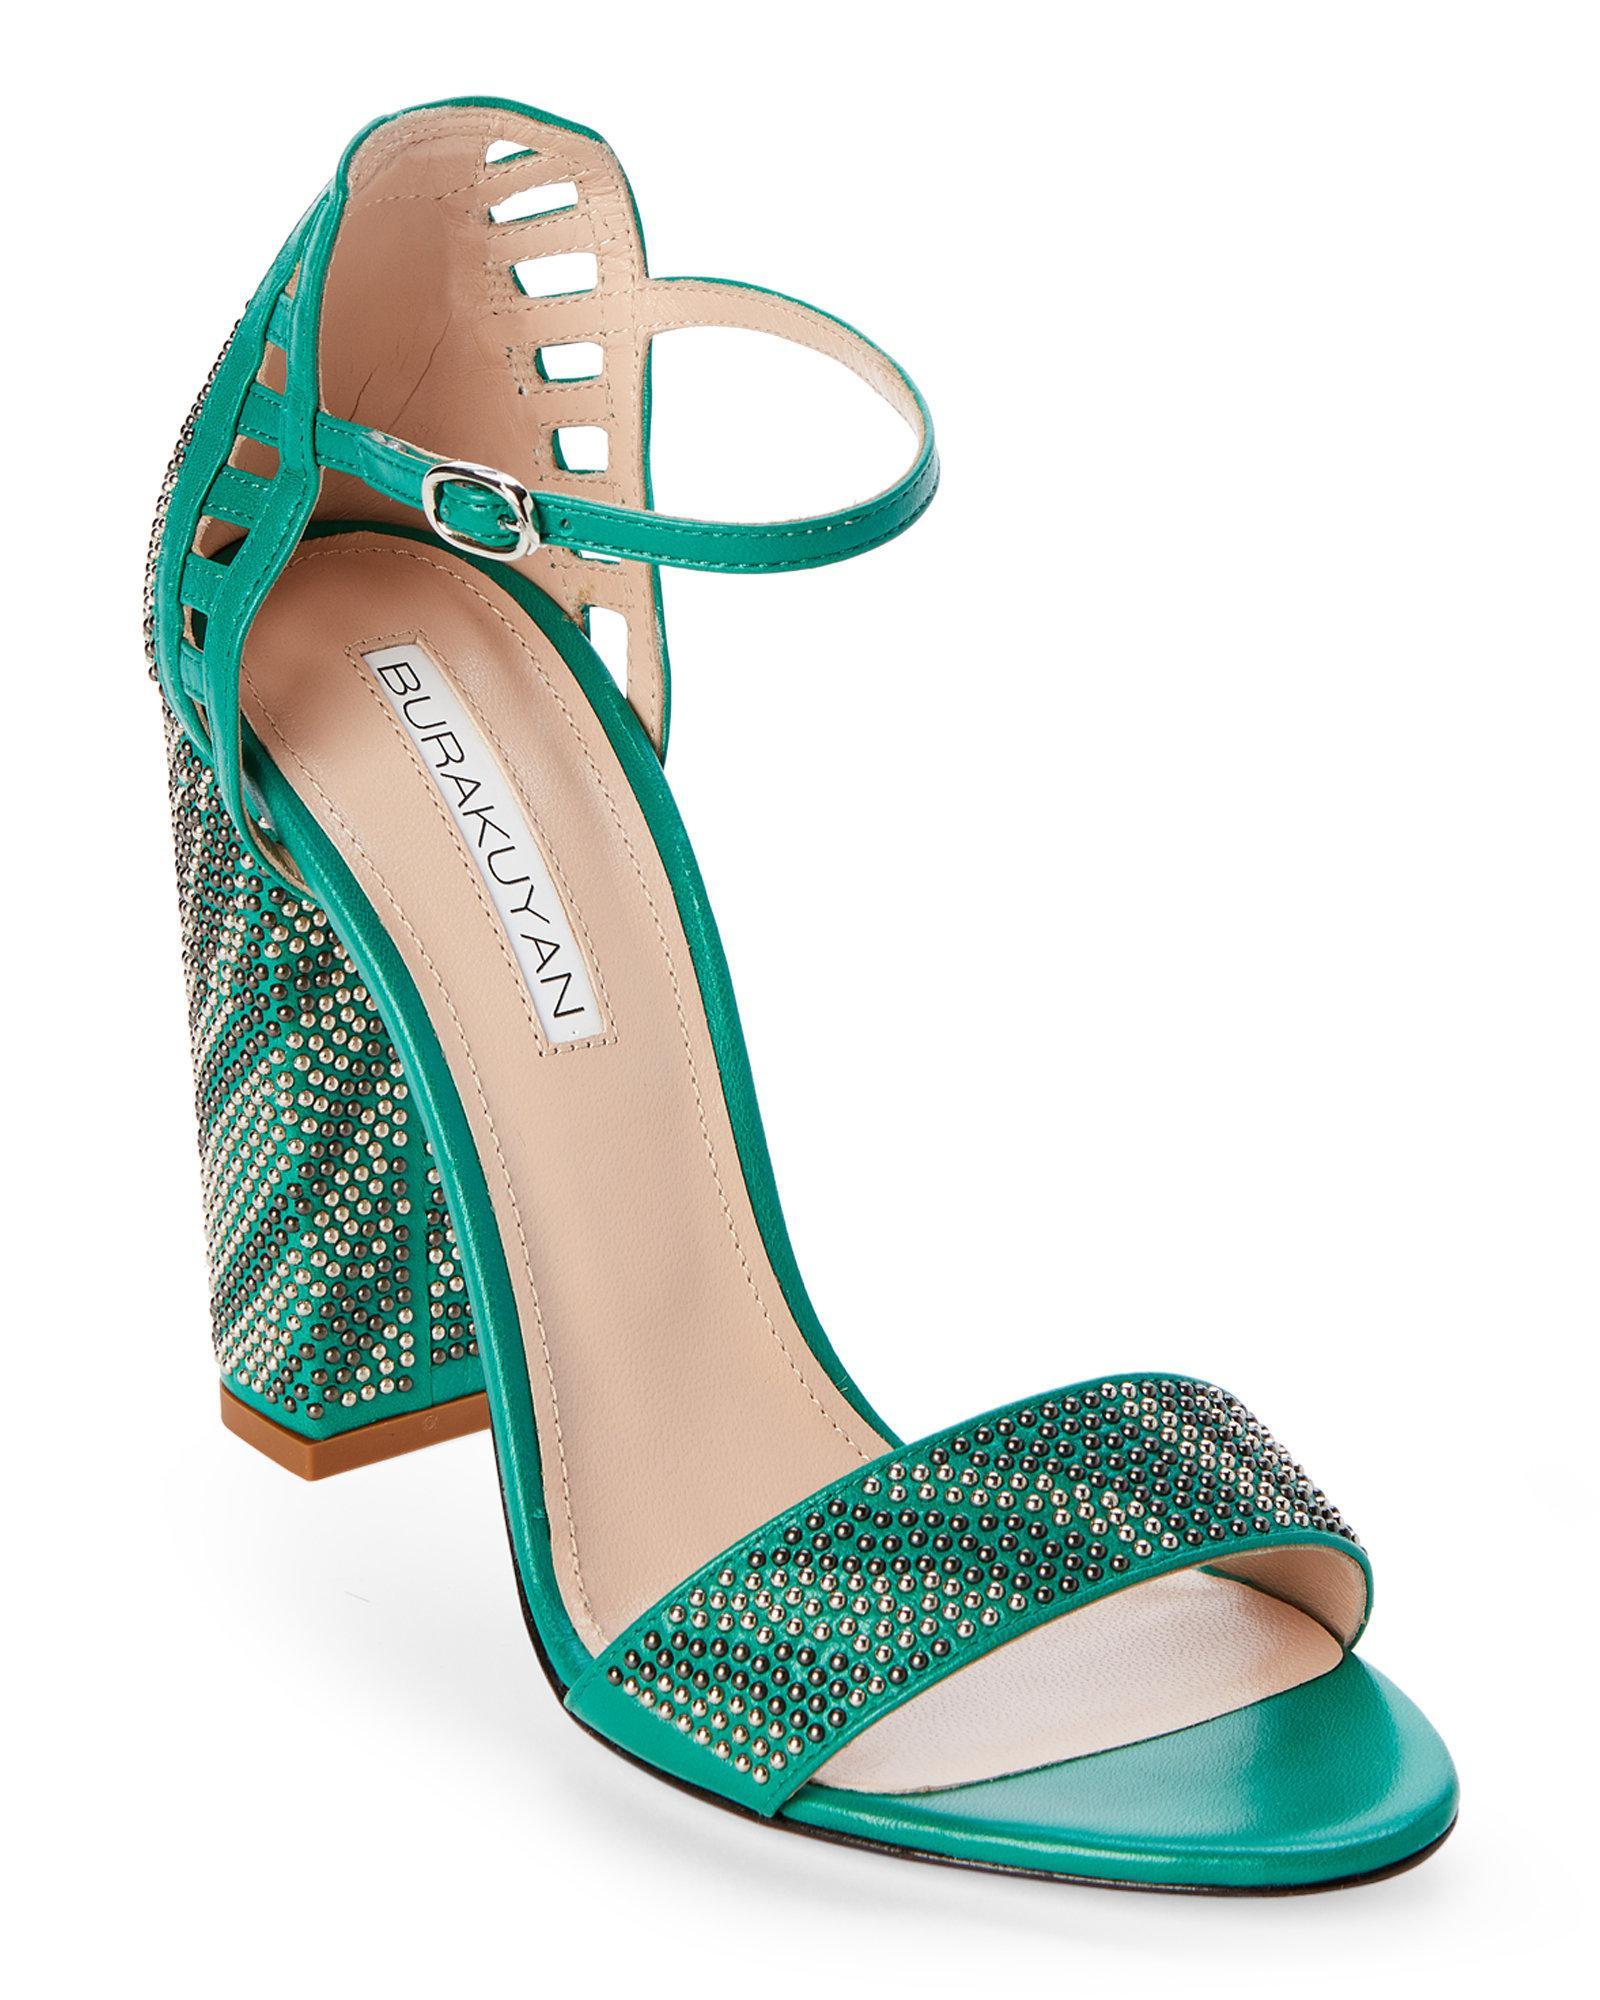 c7236e10fcc Lyst - Burak Uyan Green Studded Block Heel Sandals in Green